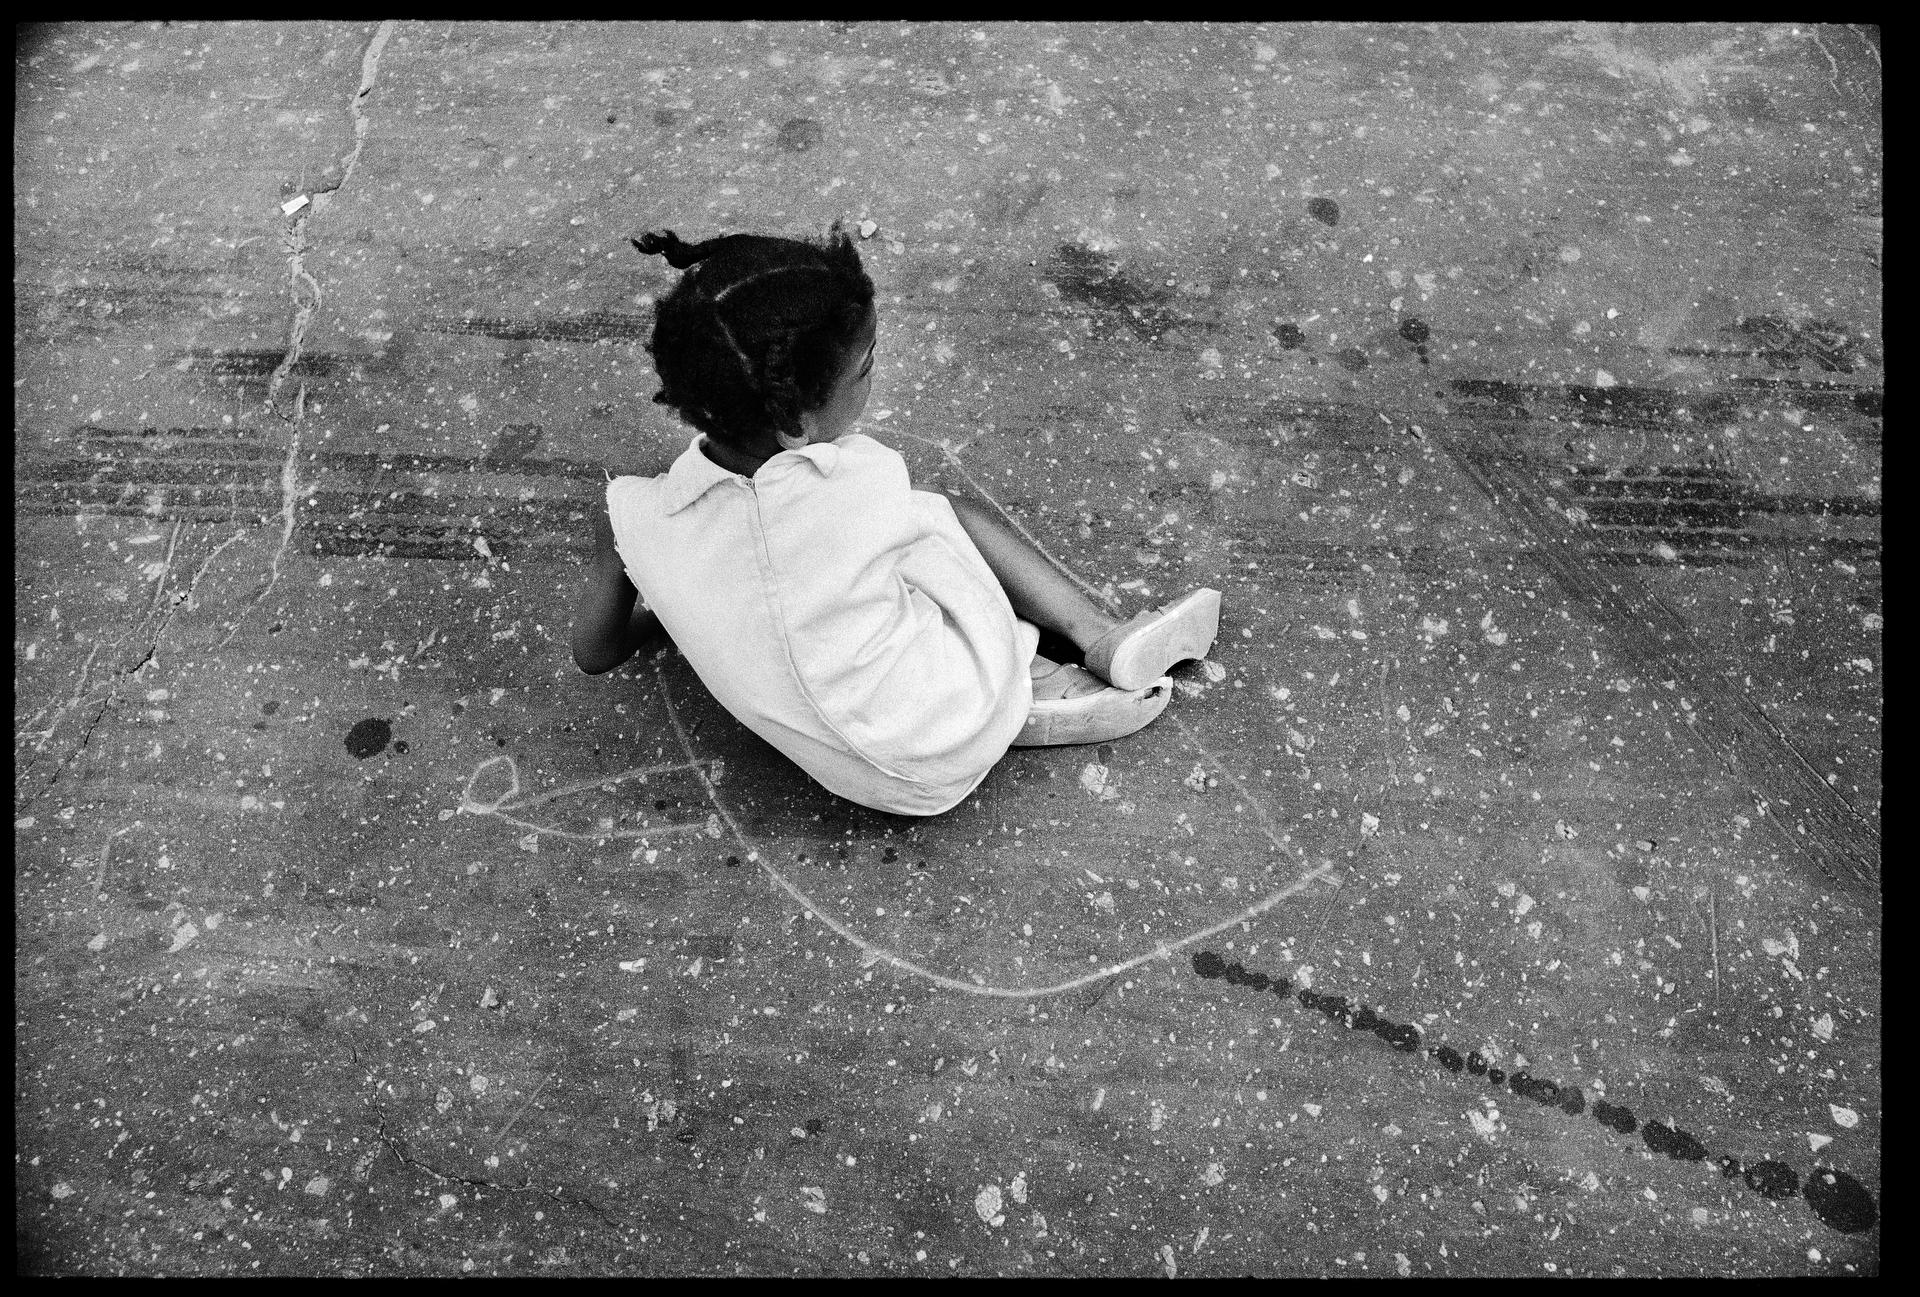 Foto di Harvey, bambina di colore a terra